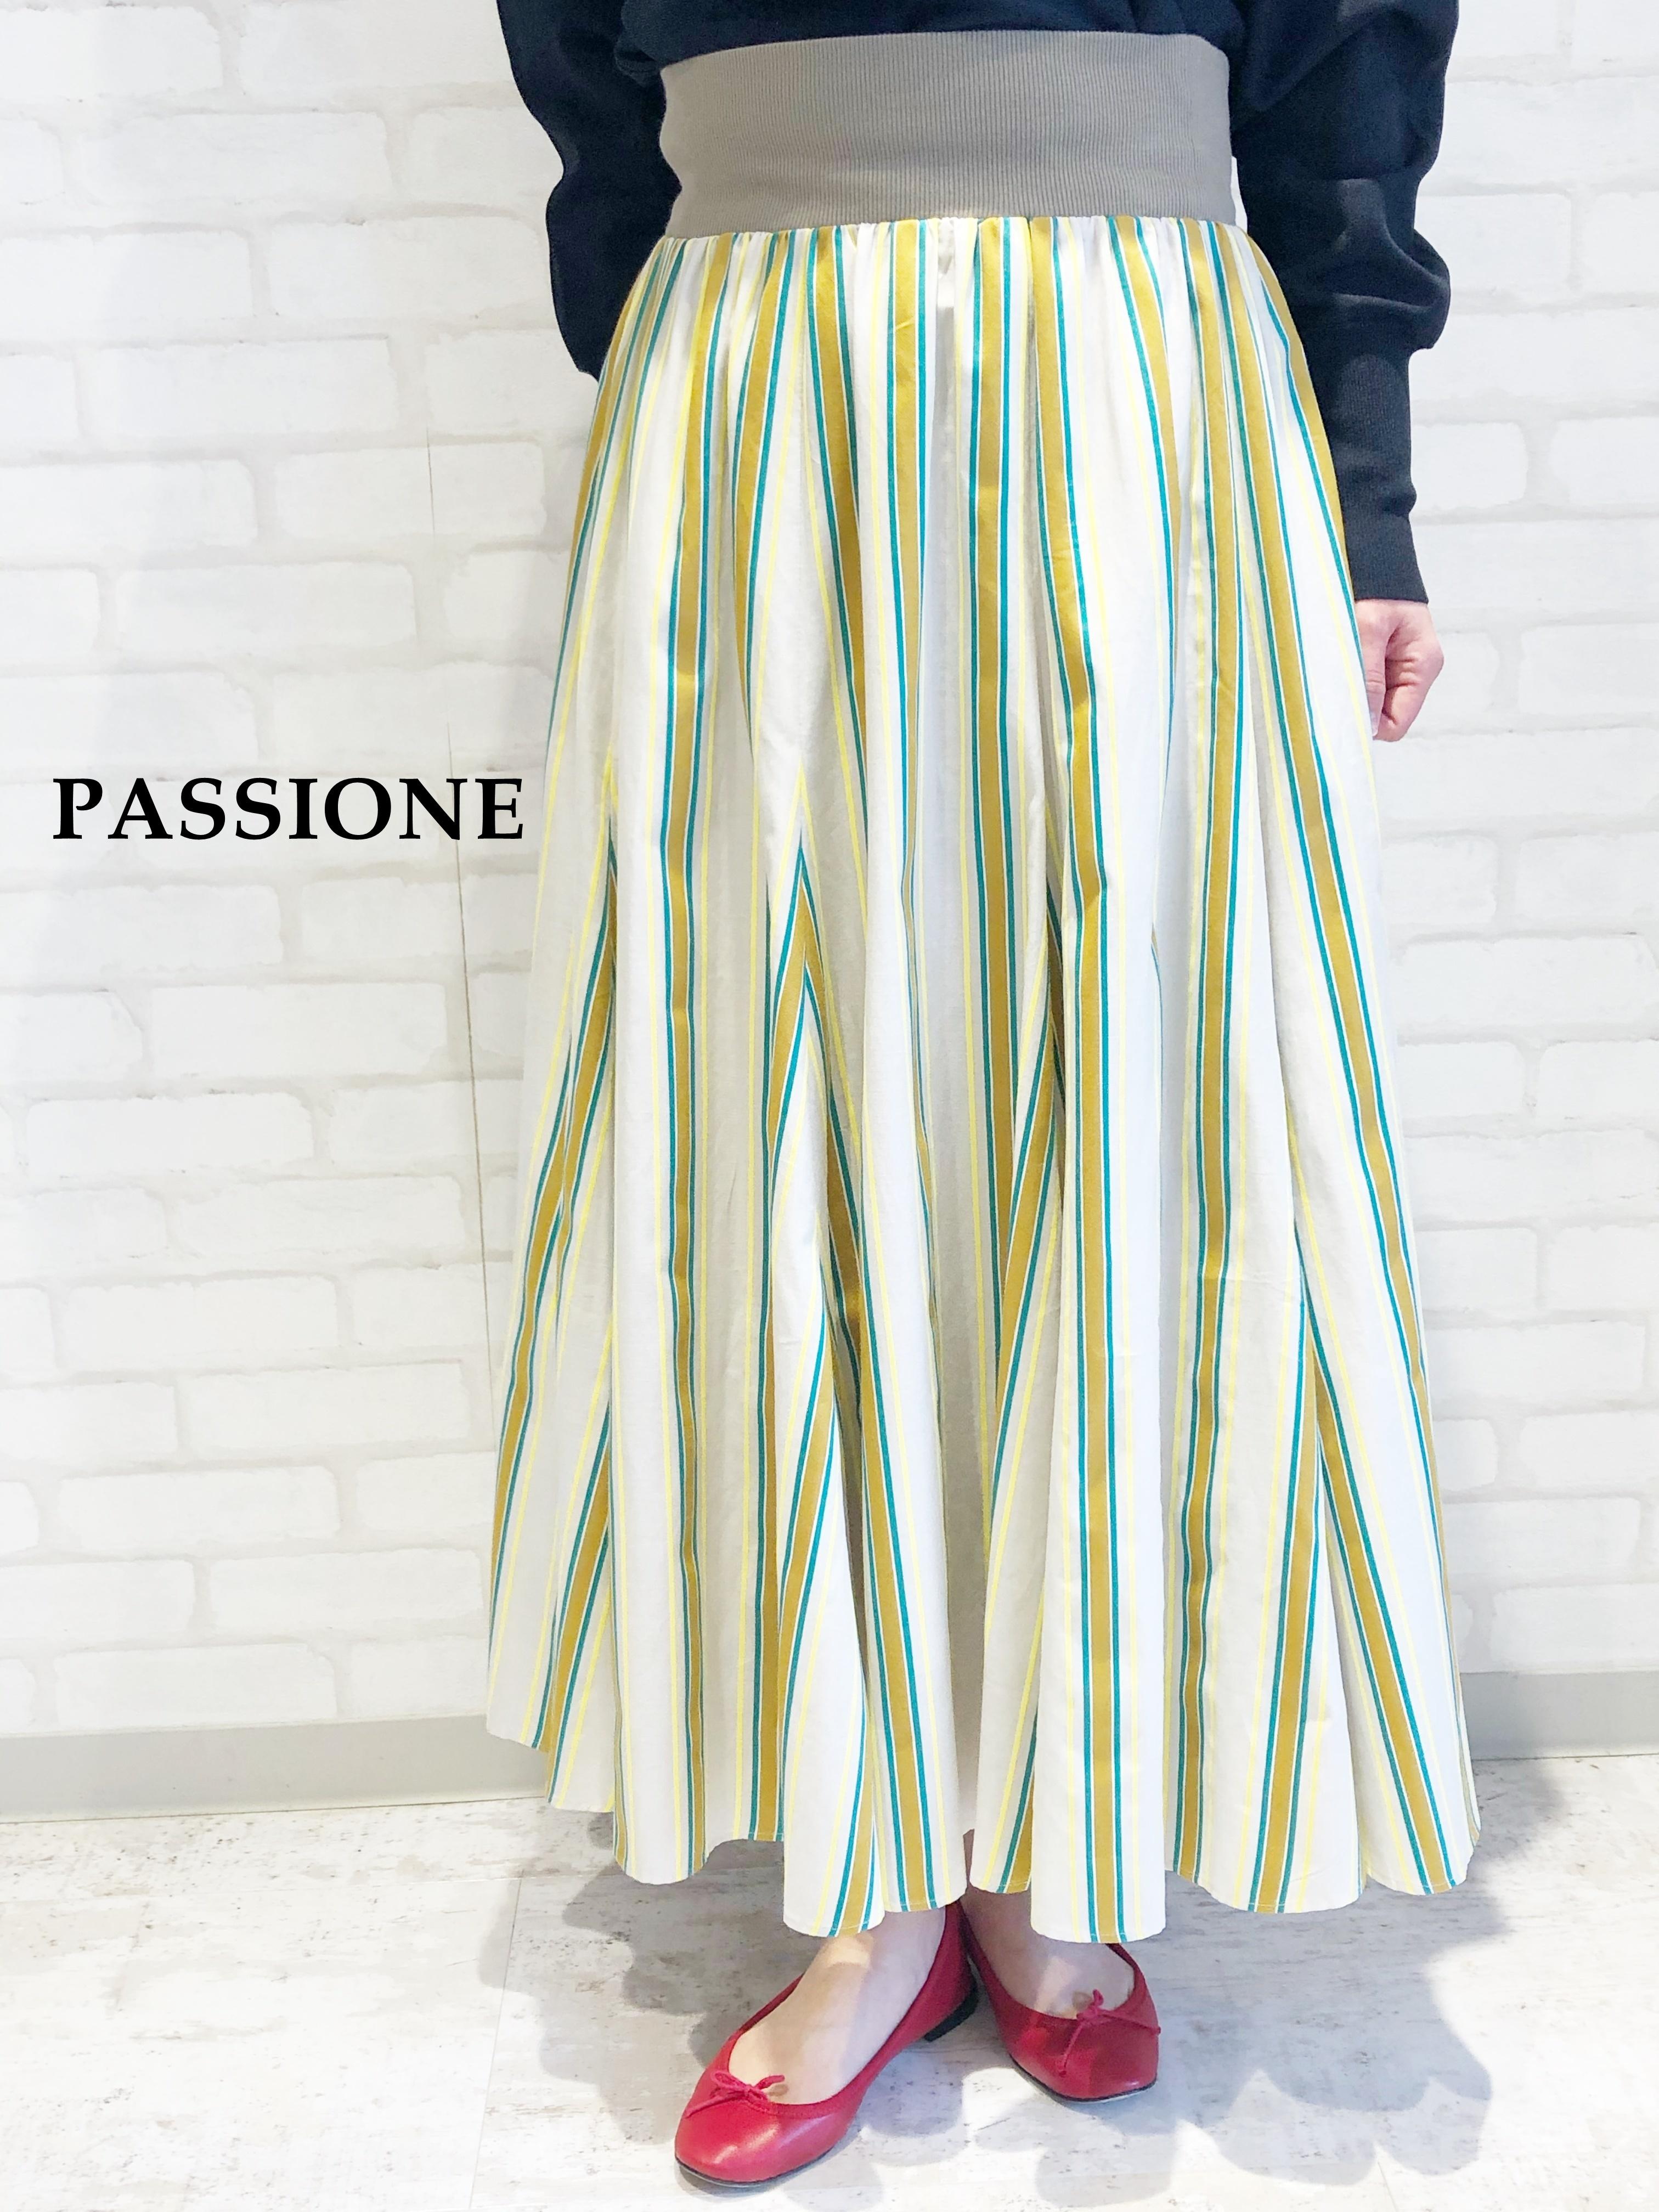 PASSIONE/フレアーロングスカート/116637(イエロー)